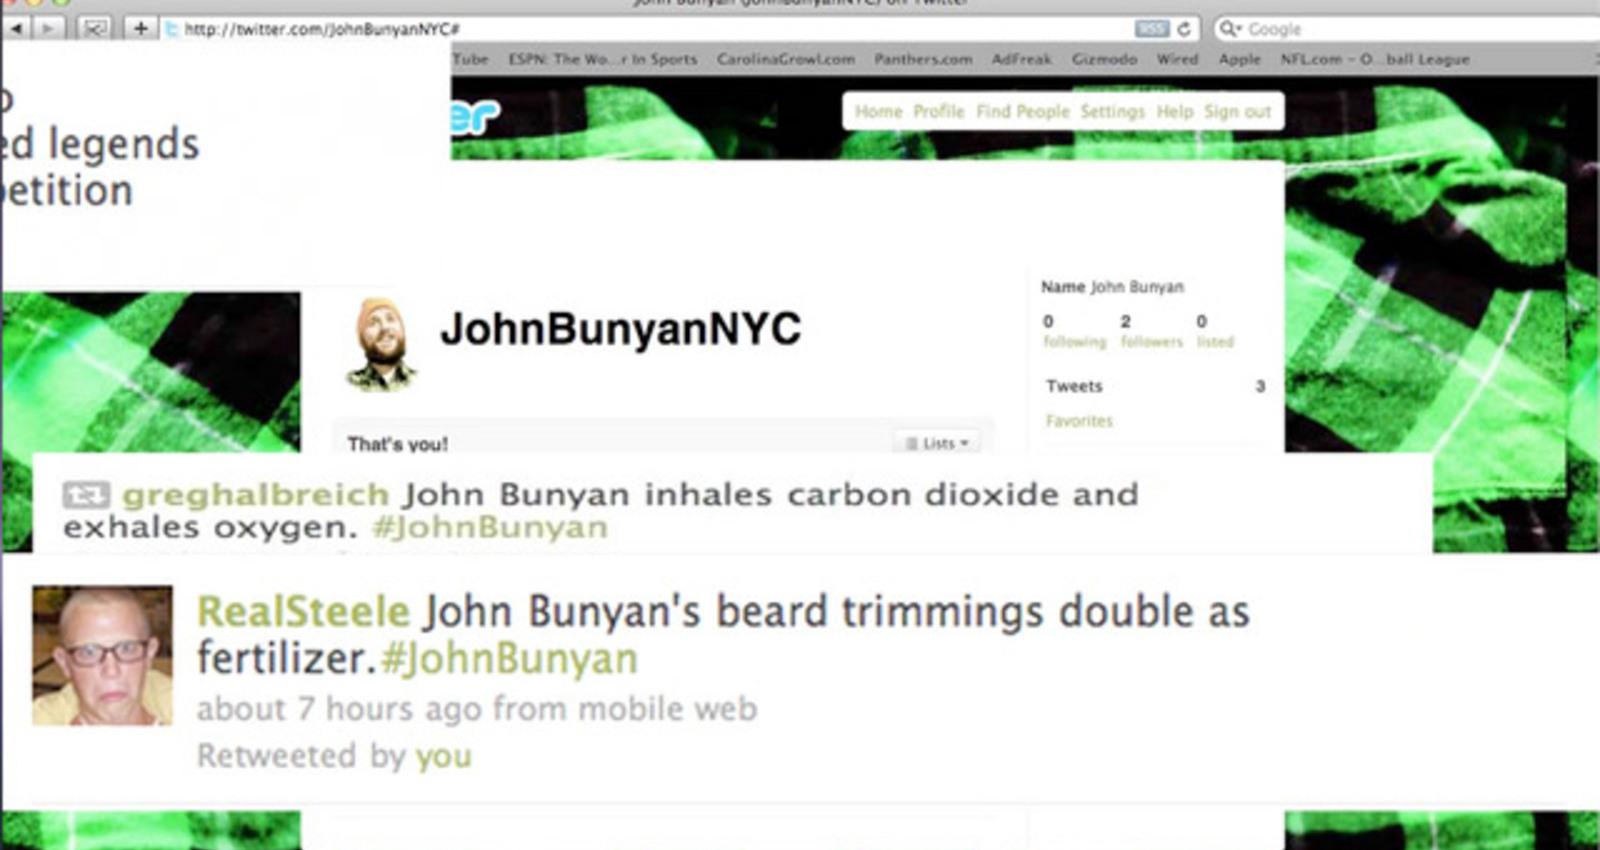 The Legend of John Bunyan and the Reverse Lumberjacks